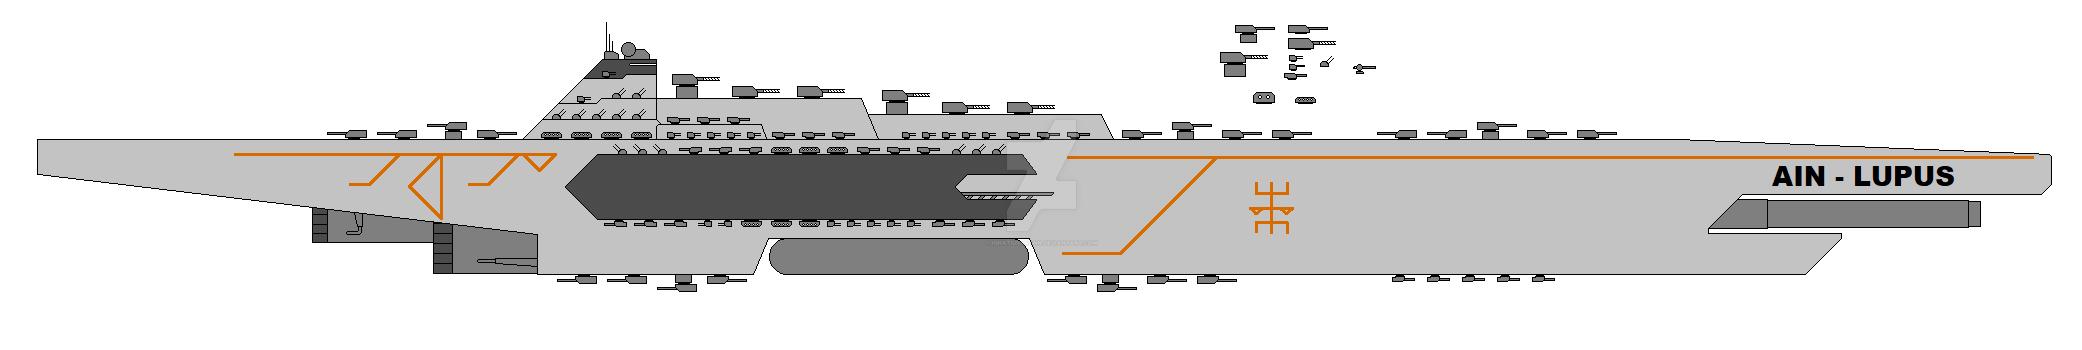 Lupus Class Destroyer Leader by IgnatiusAxonn